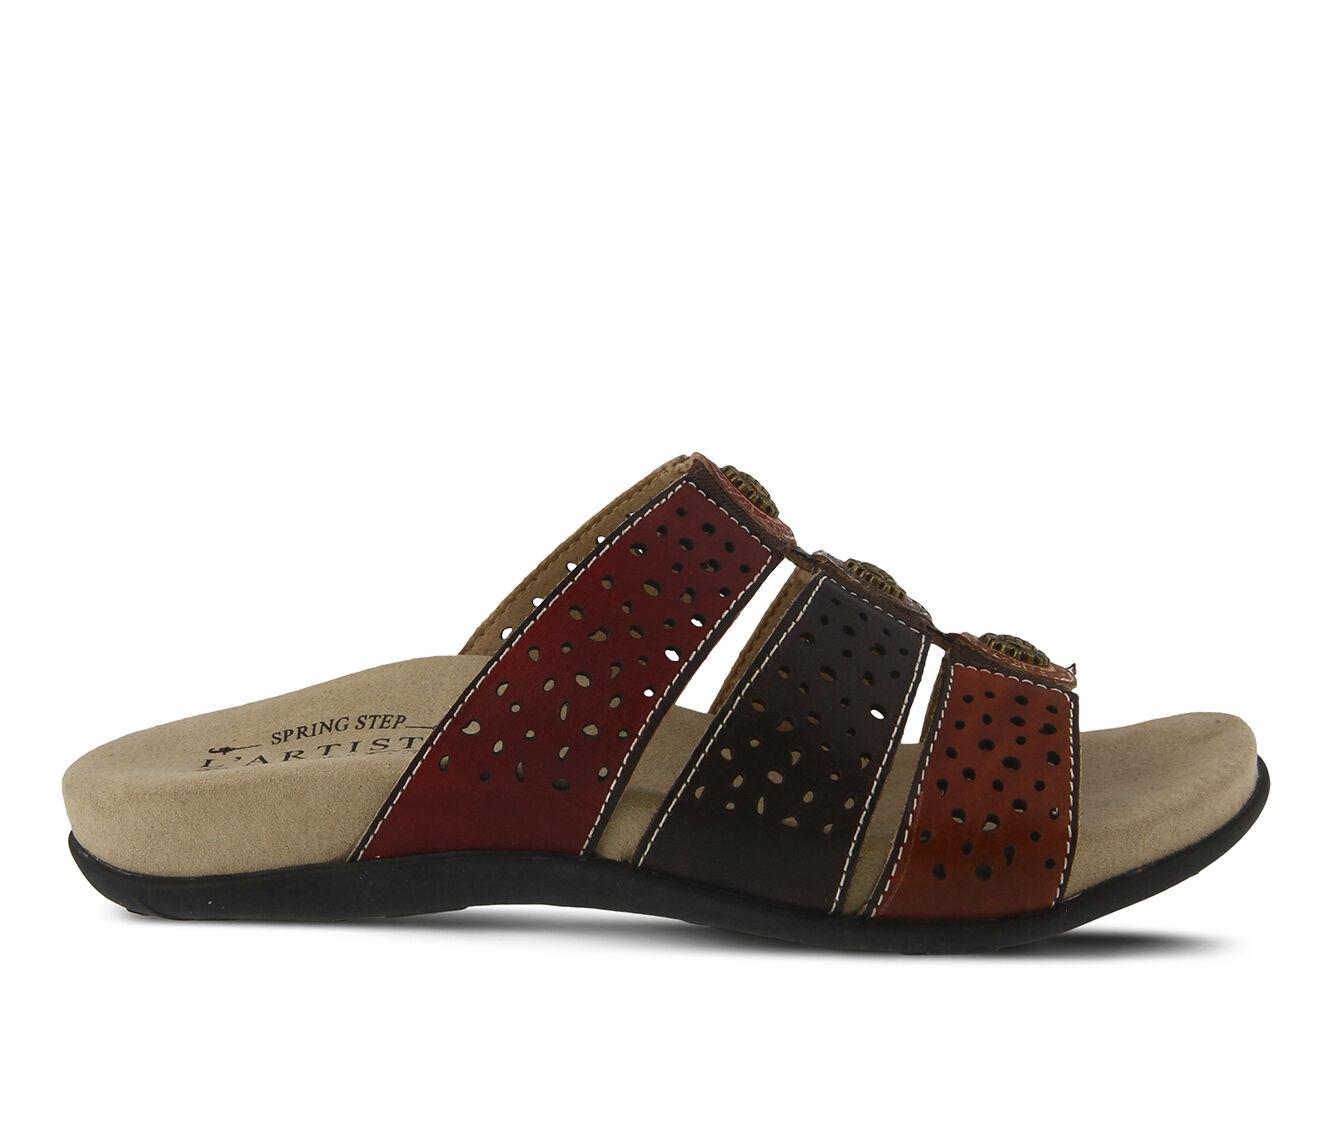 Women's L'ARTISTE Glennie Sandals Red Multi